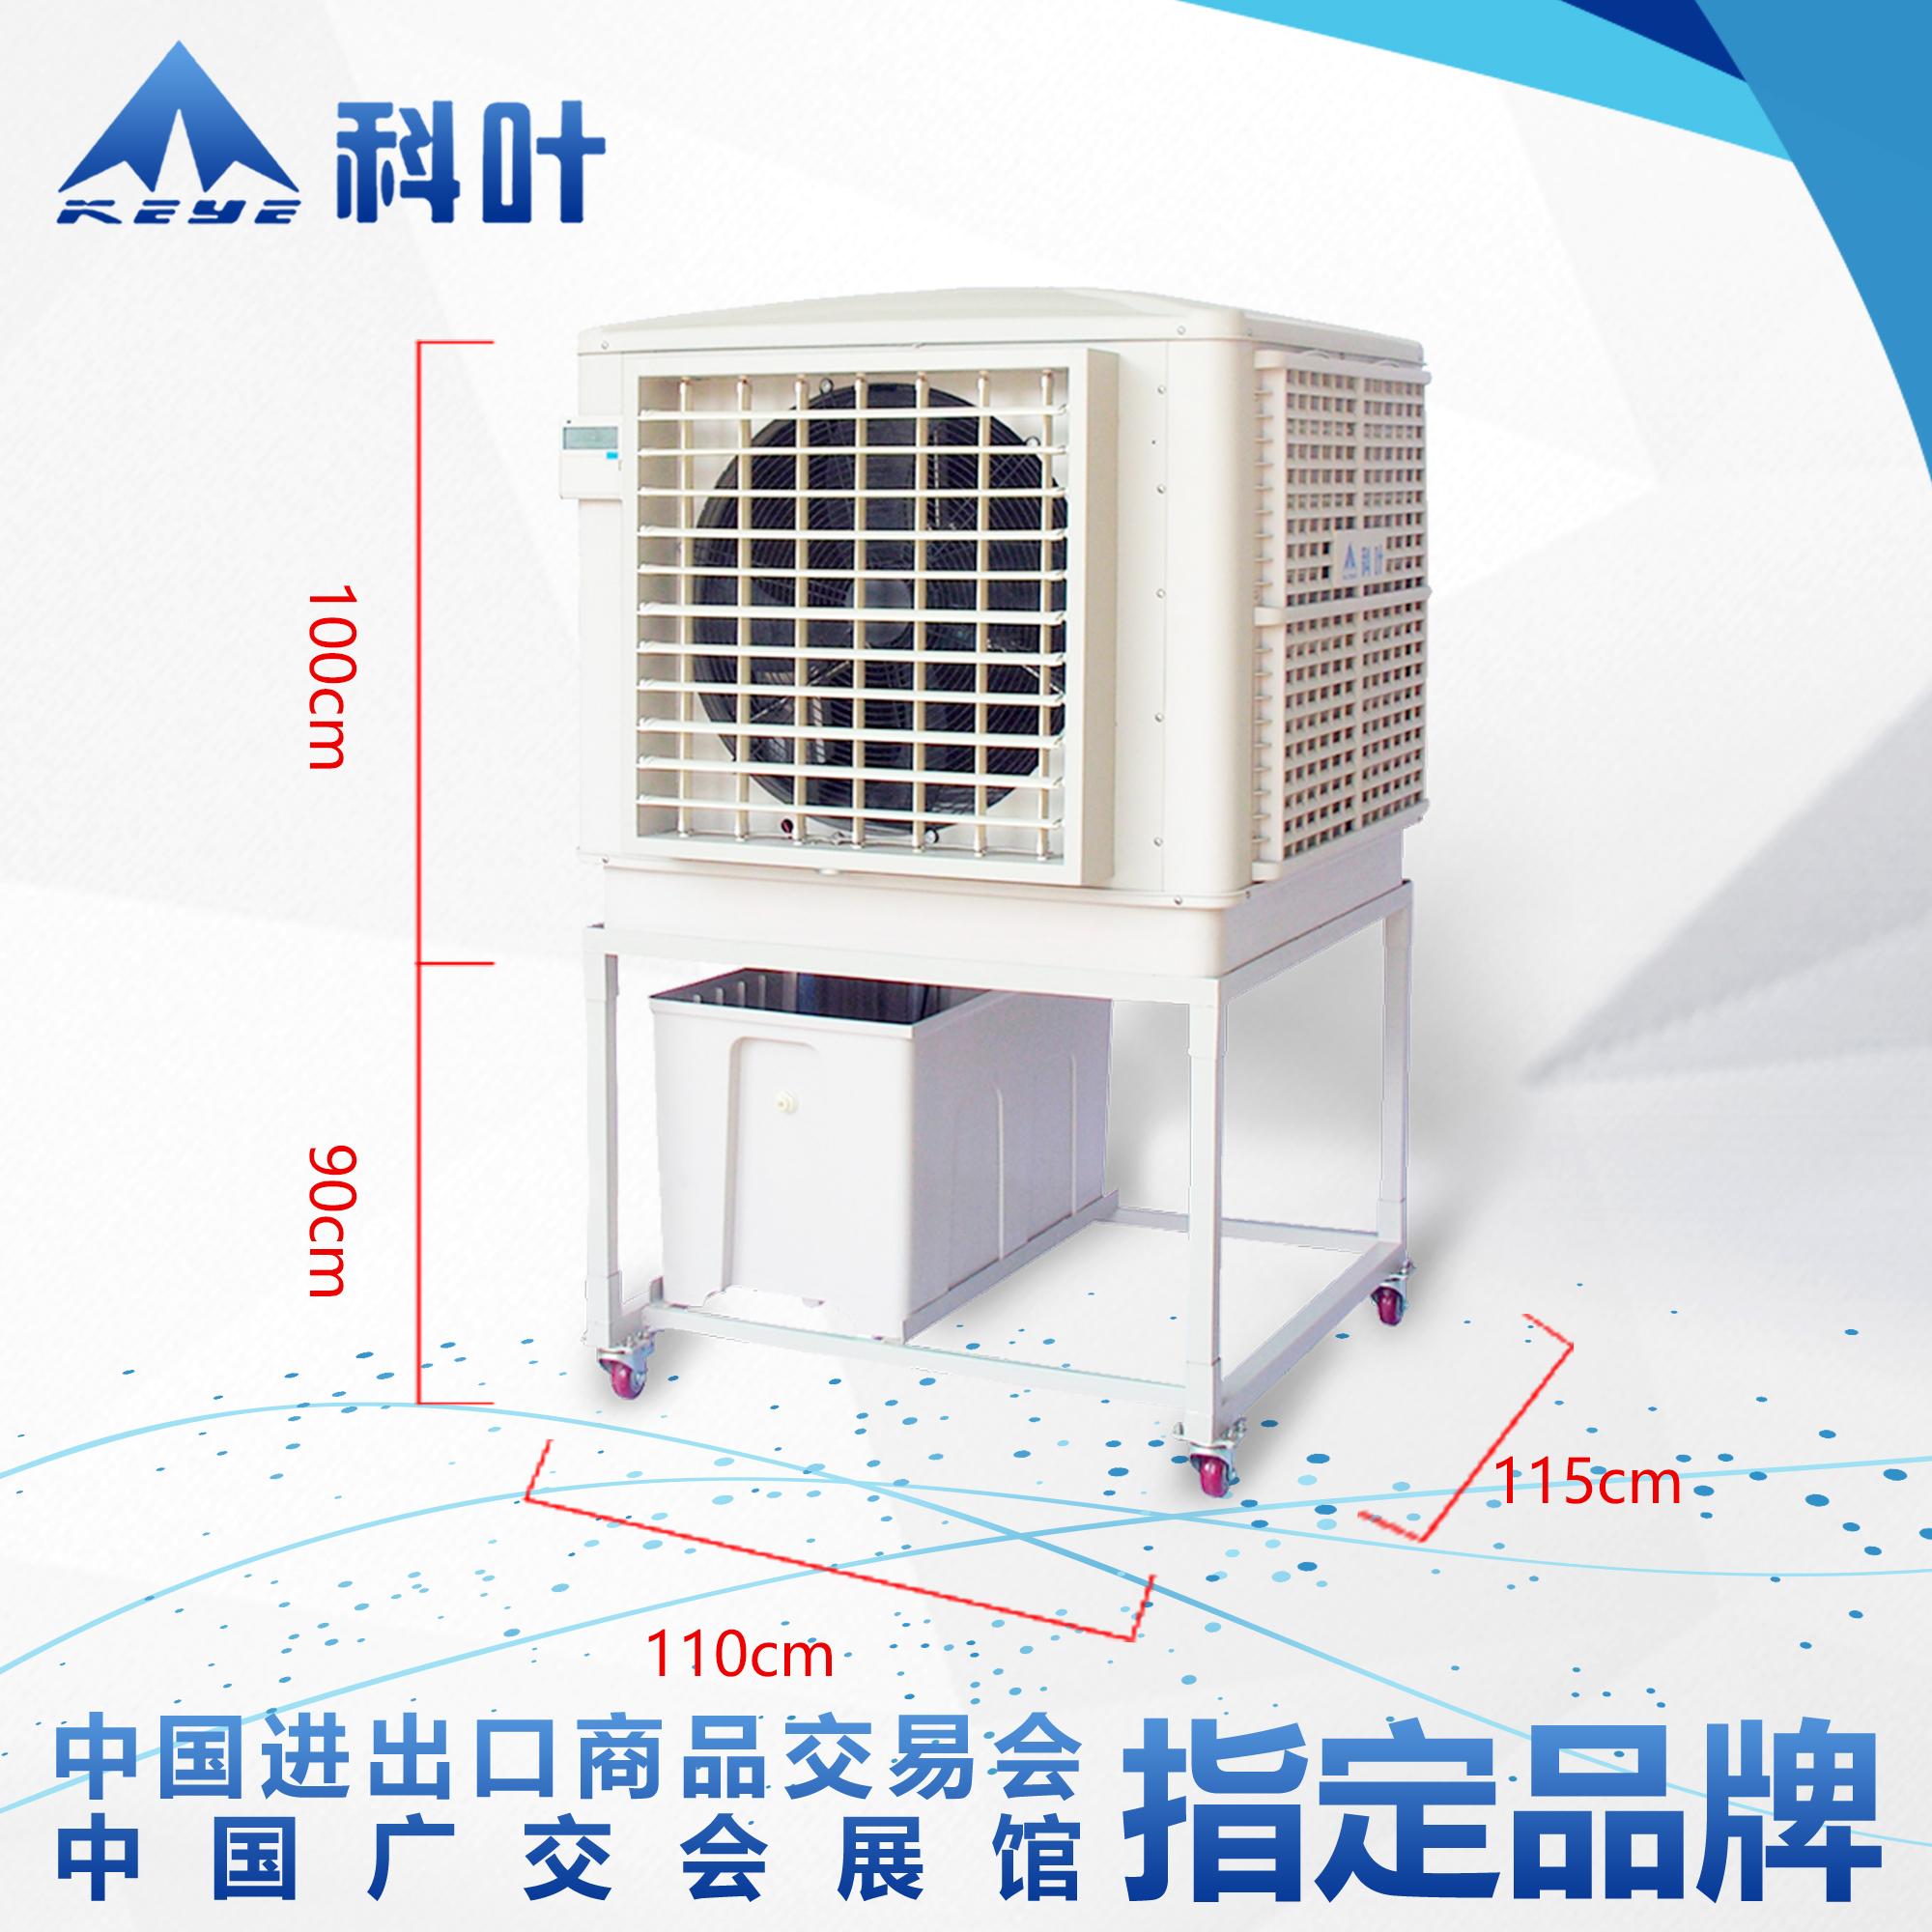 Jiuzhou Pratt & Whitney κινητών εξατμιστικές κλιματιστικά ανεμιστήρα ψύξης κλιματισμού τμήμα ZC/BP-18Y φύλλα, προστασία του περιβάλλοντος